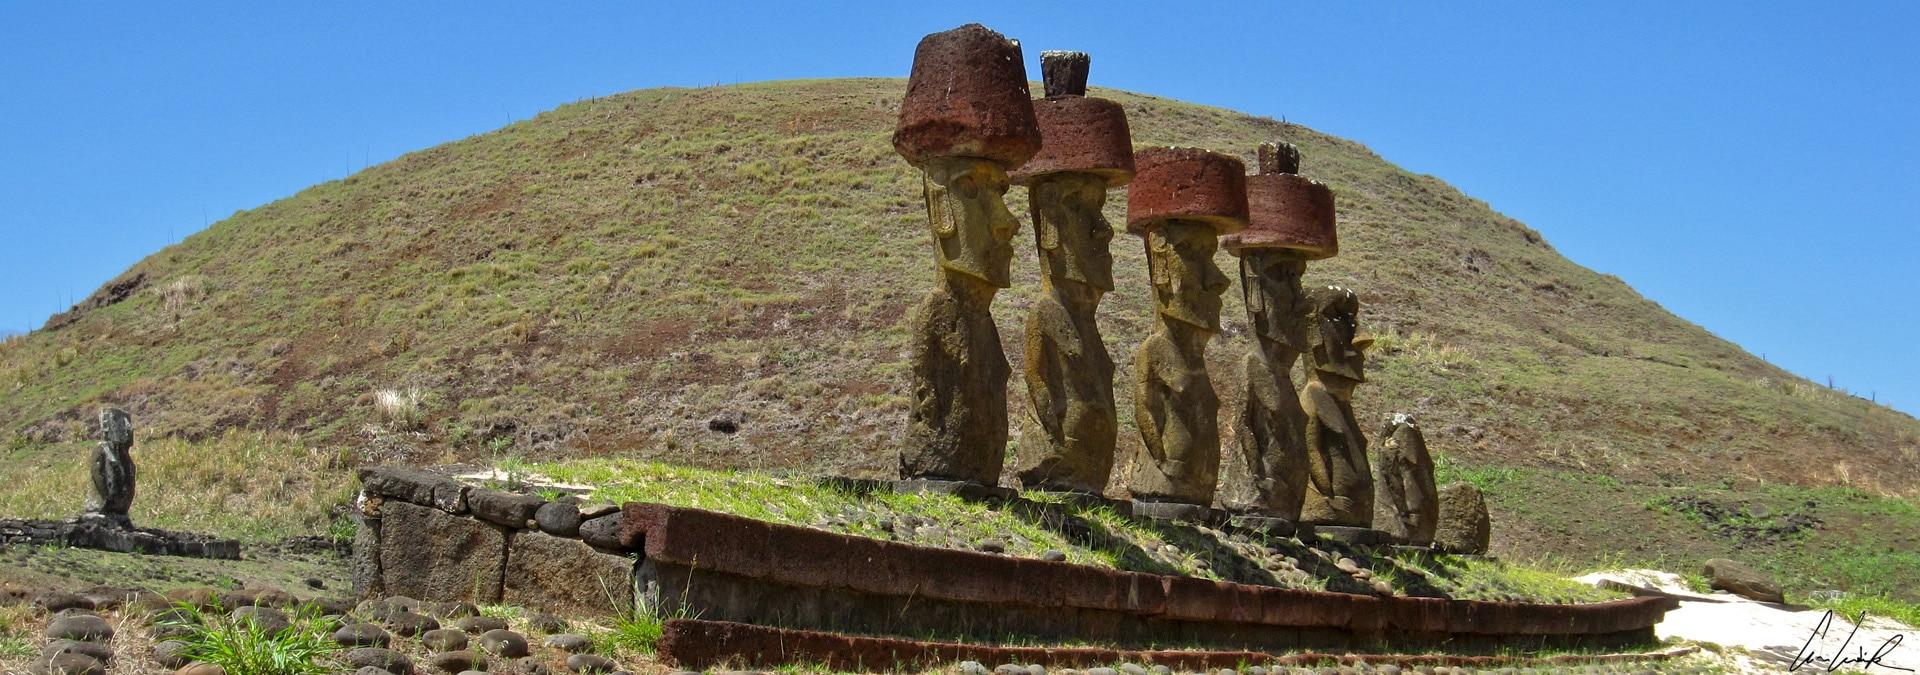 Easter Island, Mysterious Rapa Nui